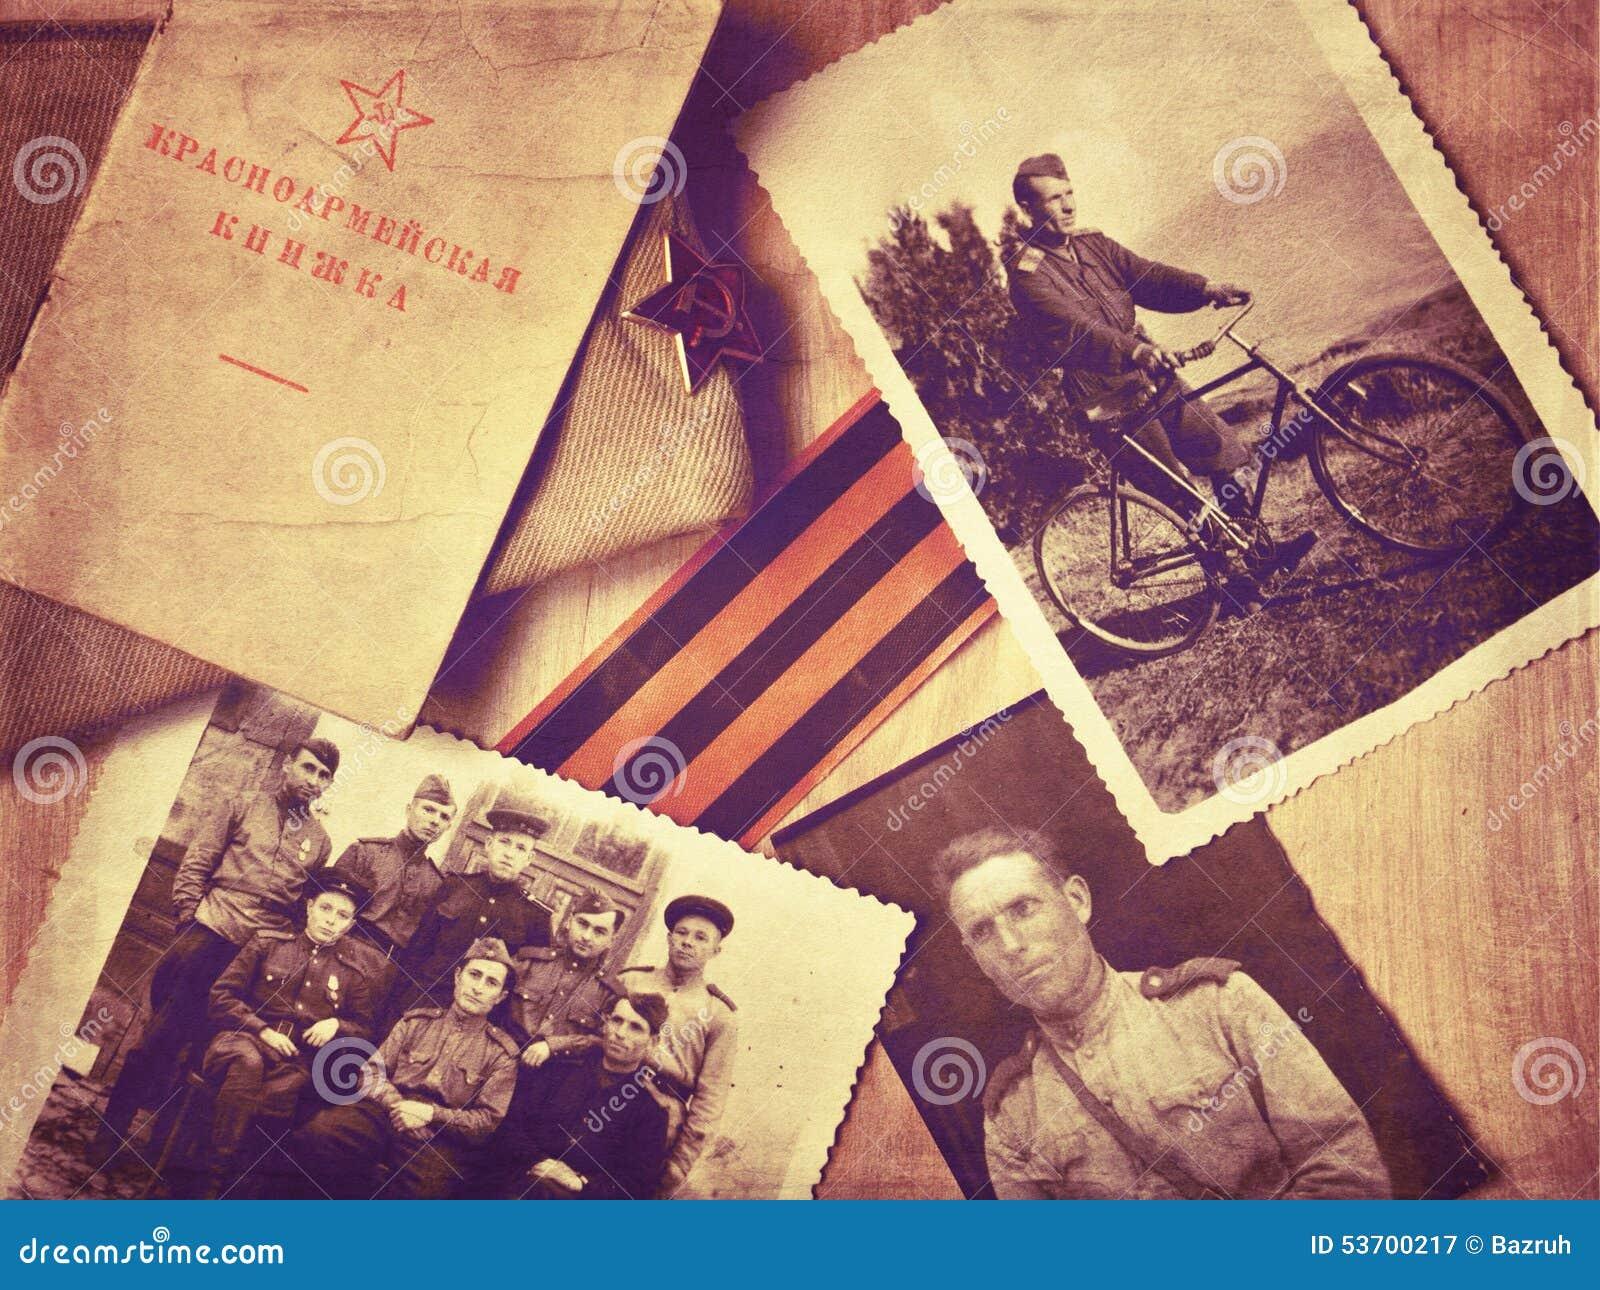 Vintage photos of World War II